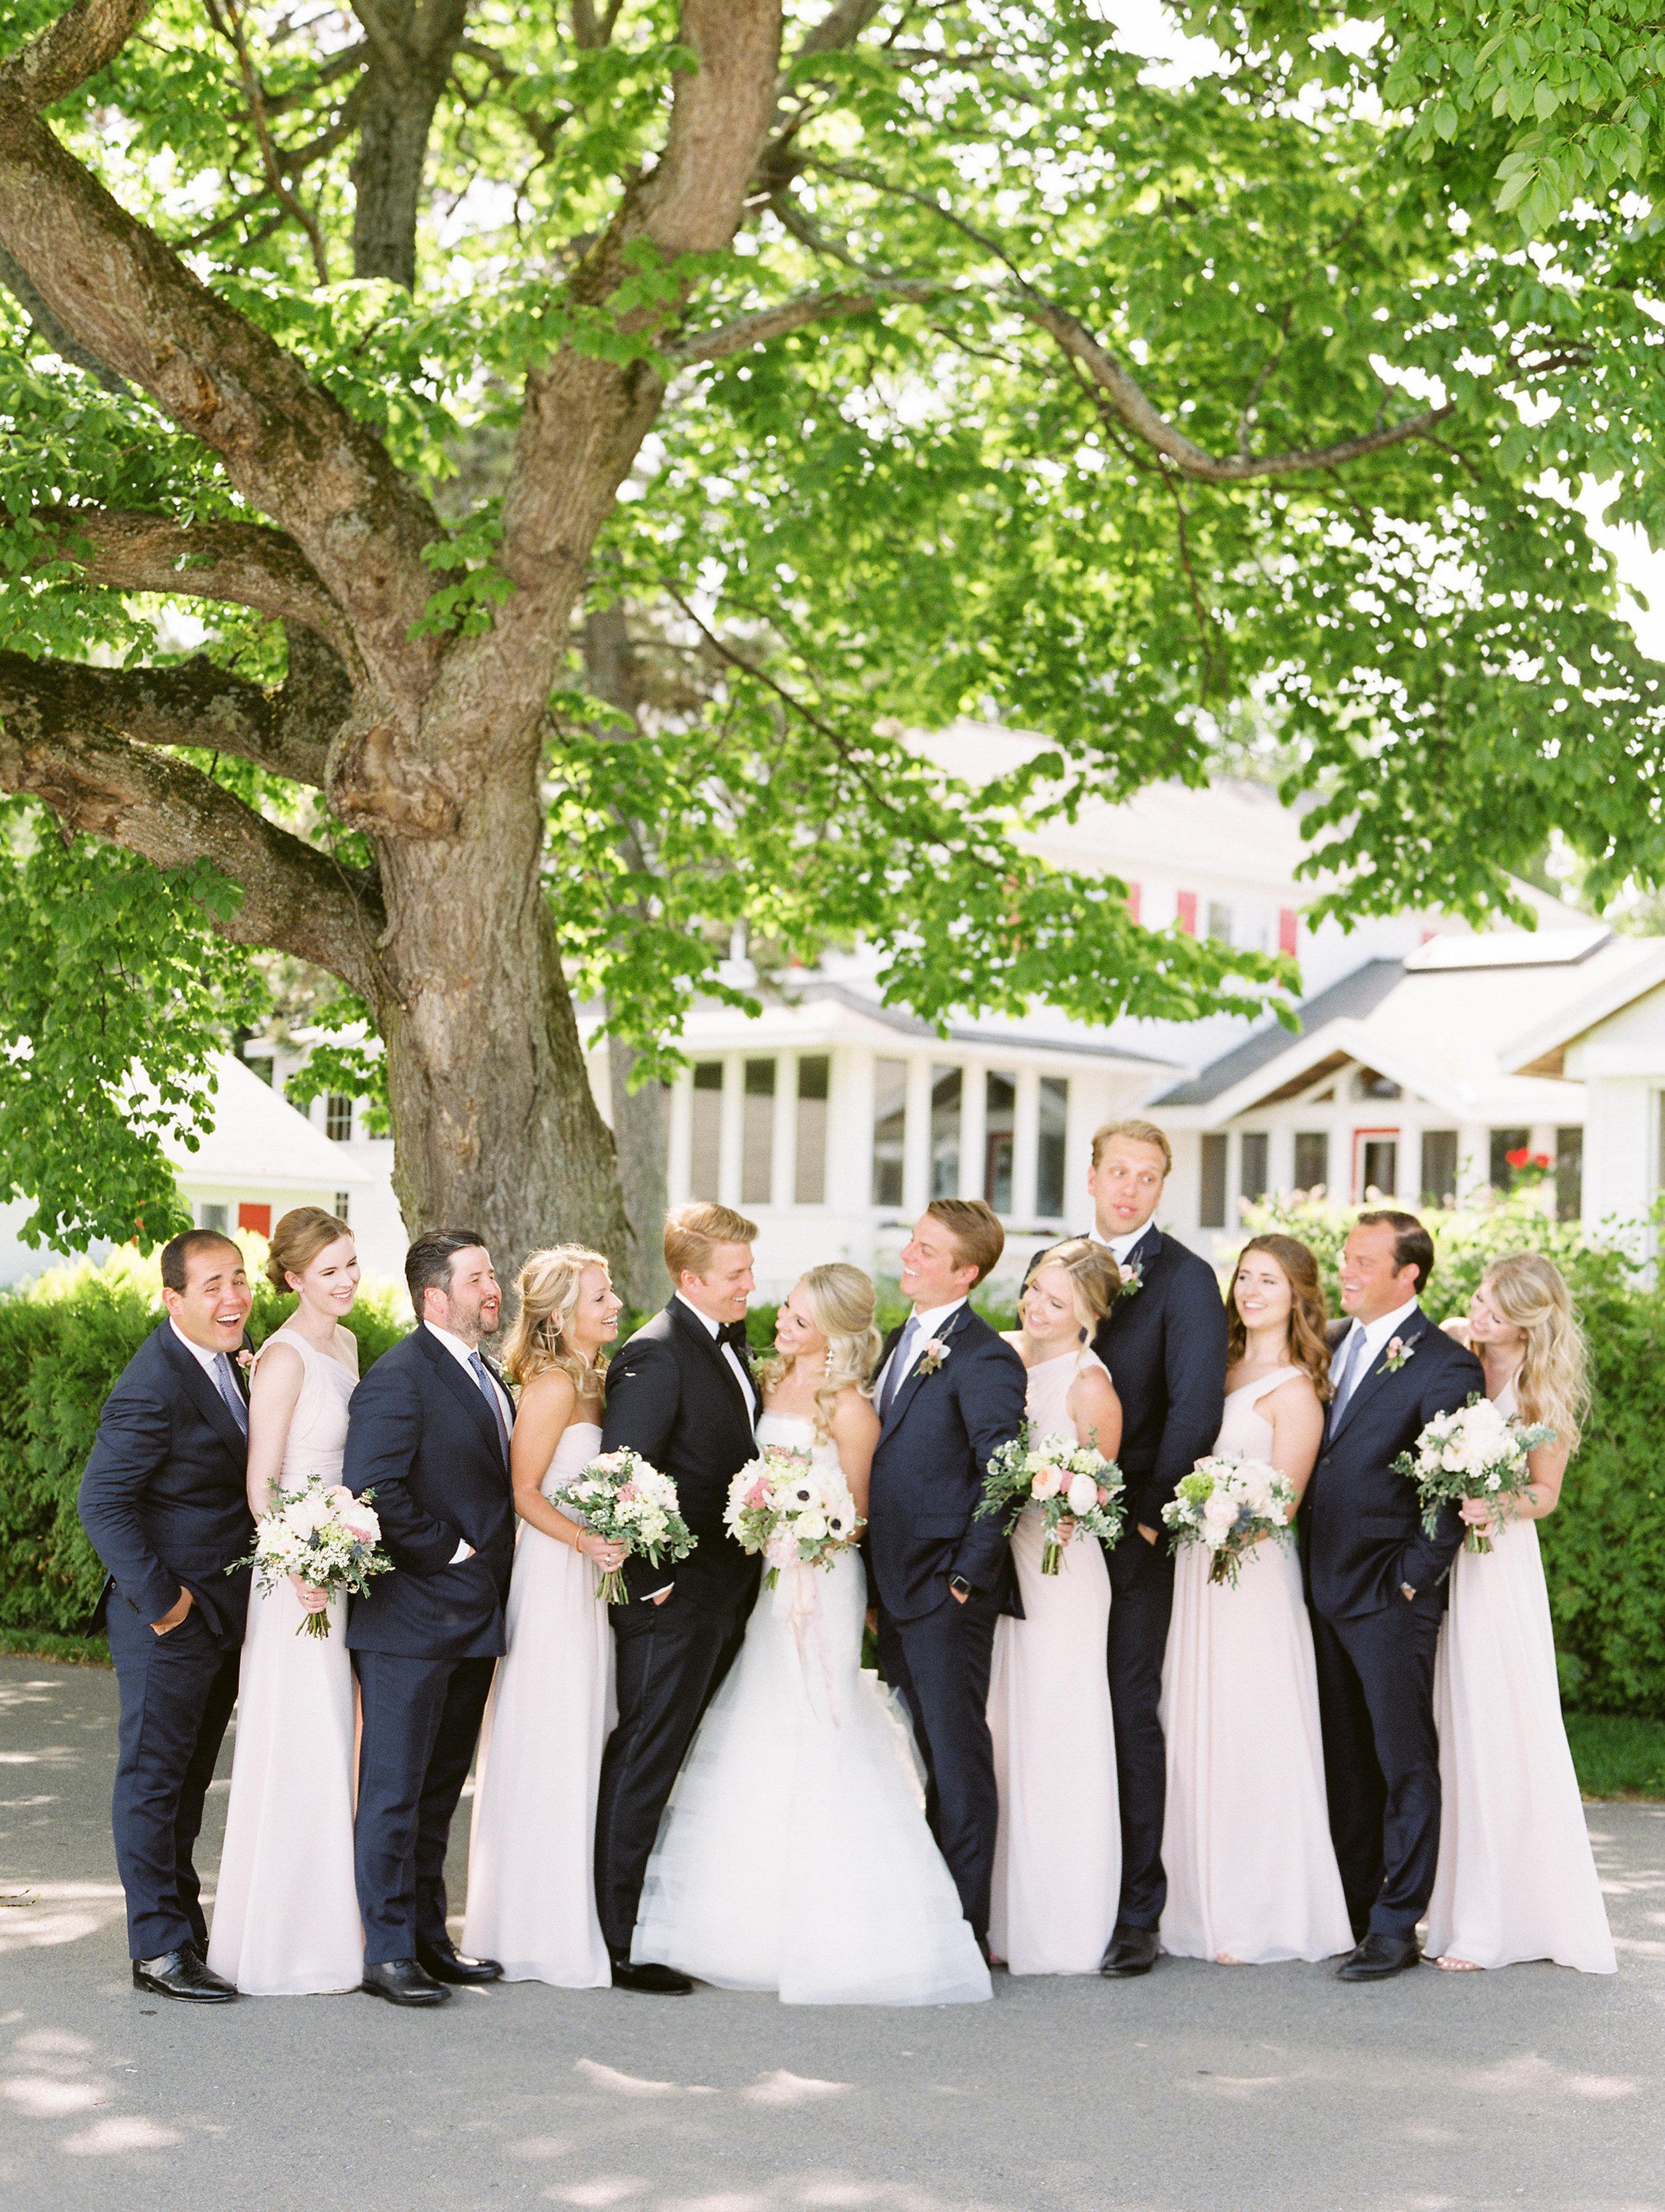 Coffman+Wedding+Bridal+Party-24.jpg